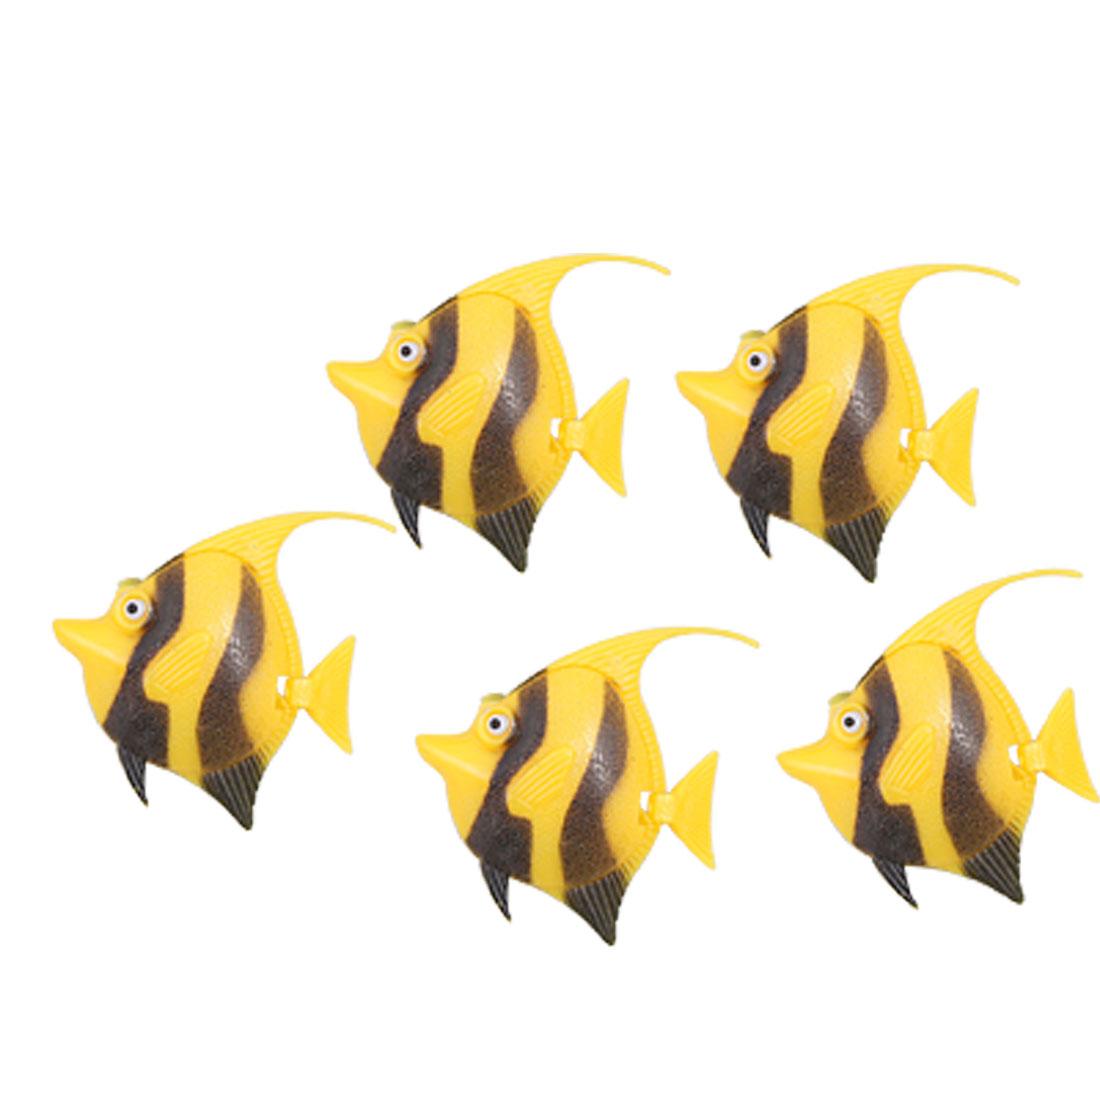 5pcs Black Yellow Stripes Plastic Floating Fish Aquarium Decoration